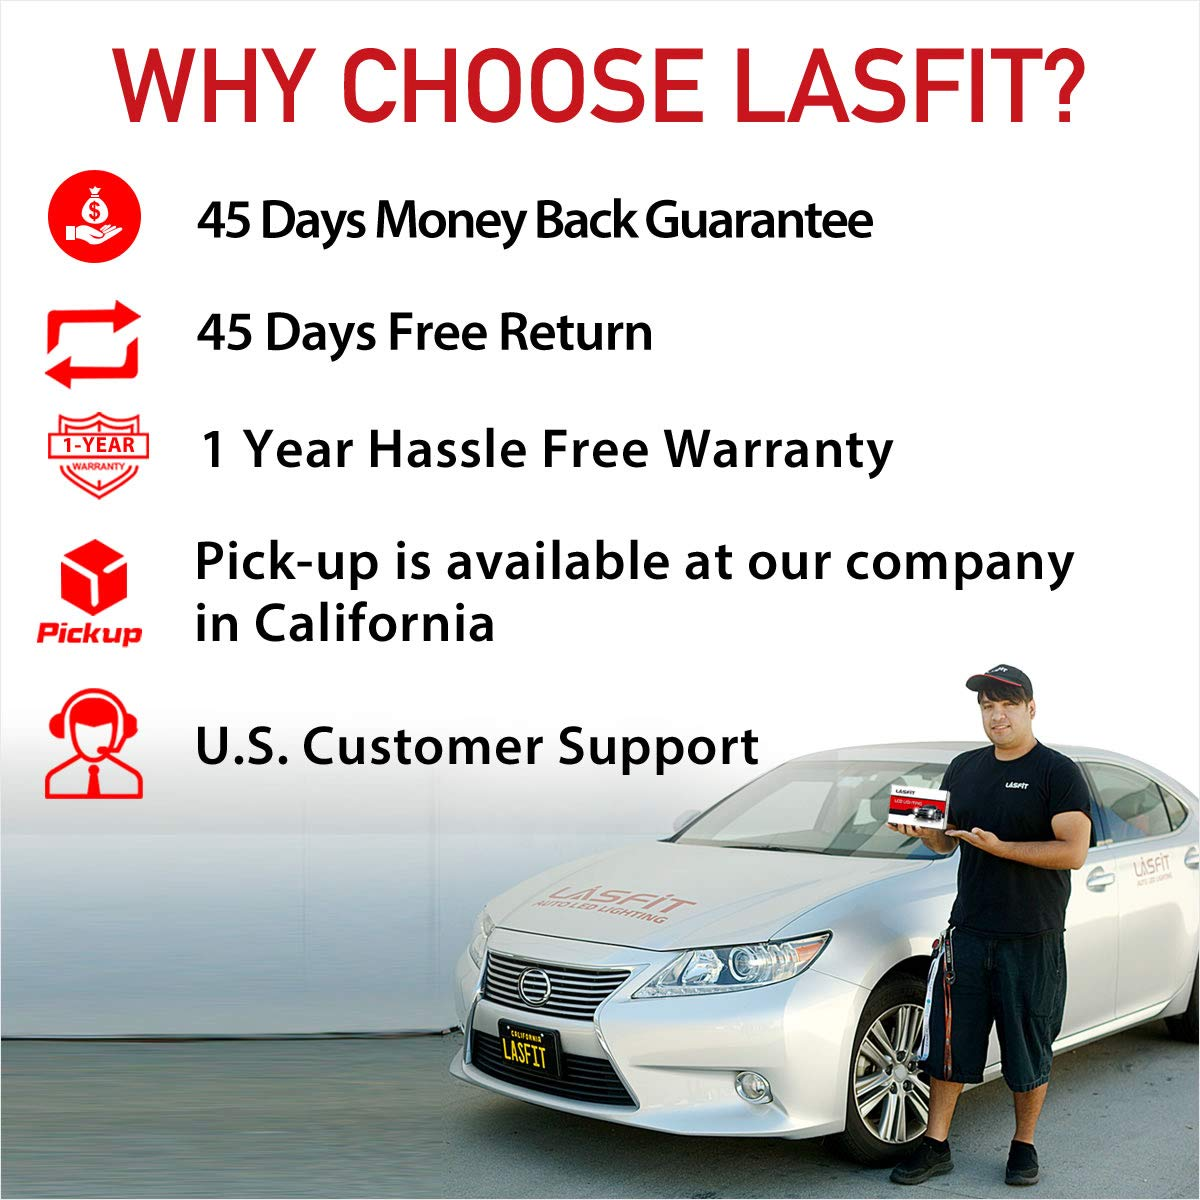 LASFIT 5202/5201/2504 LED Fog Light 60W 7600LM 6000K Cool White LED Bulbs-Plug&Play (2 pack) by LASFIT (Image #8)